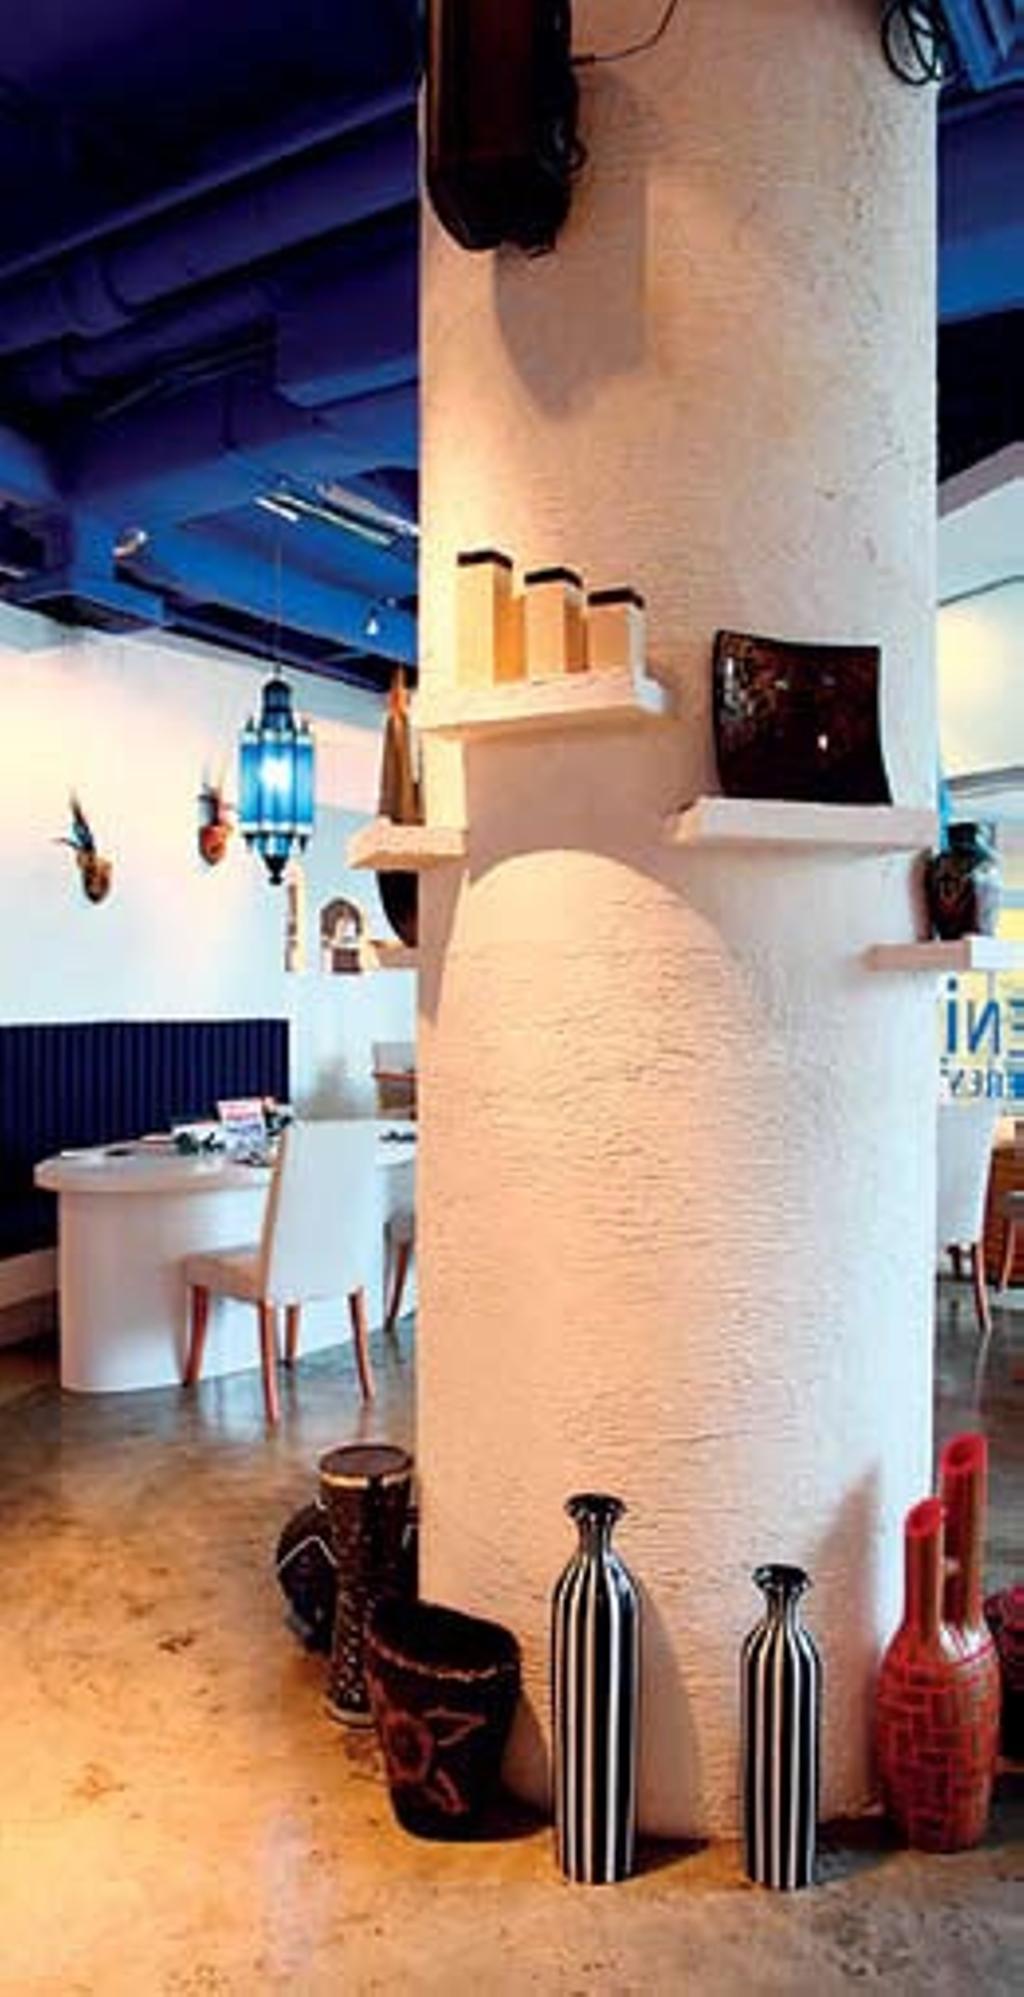 Serenity Restaurant Vivo City, Commercial, Interior Designer, Inside Story, Eclectic